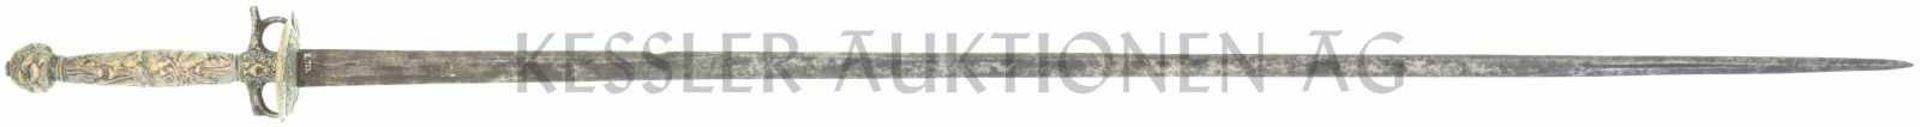 Galadegen Knabenwaffe um 1690 TL=870mm, KL=740mm, Rückenklinge mit beidseitiger Hohlbahn, Spitze